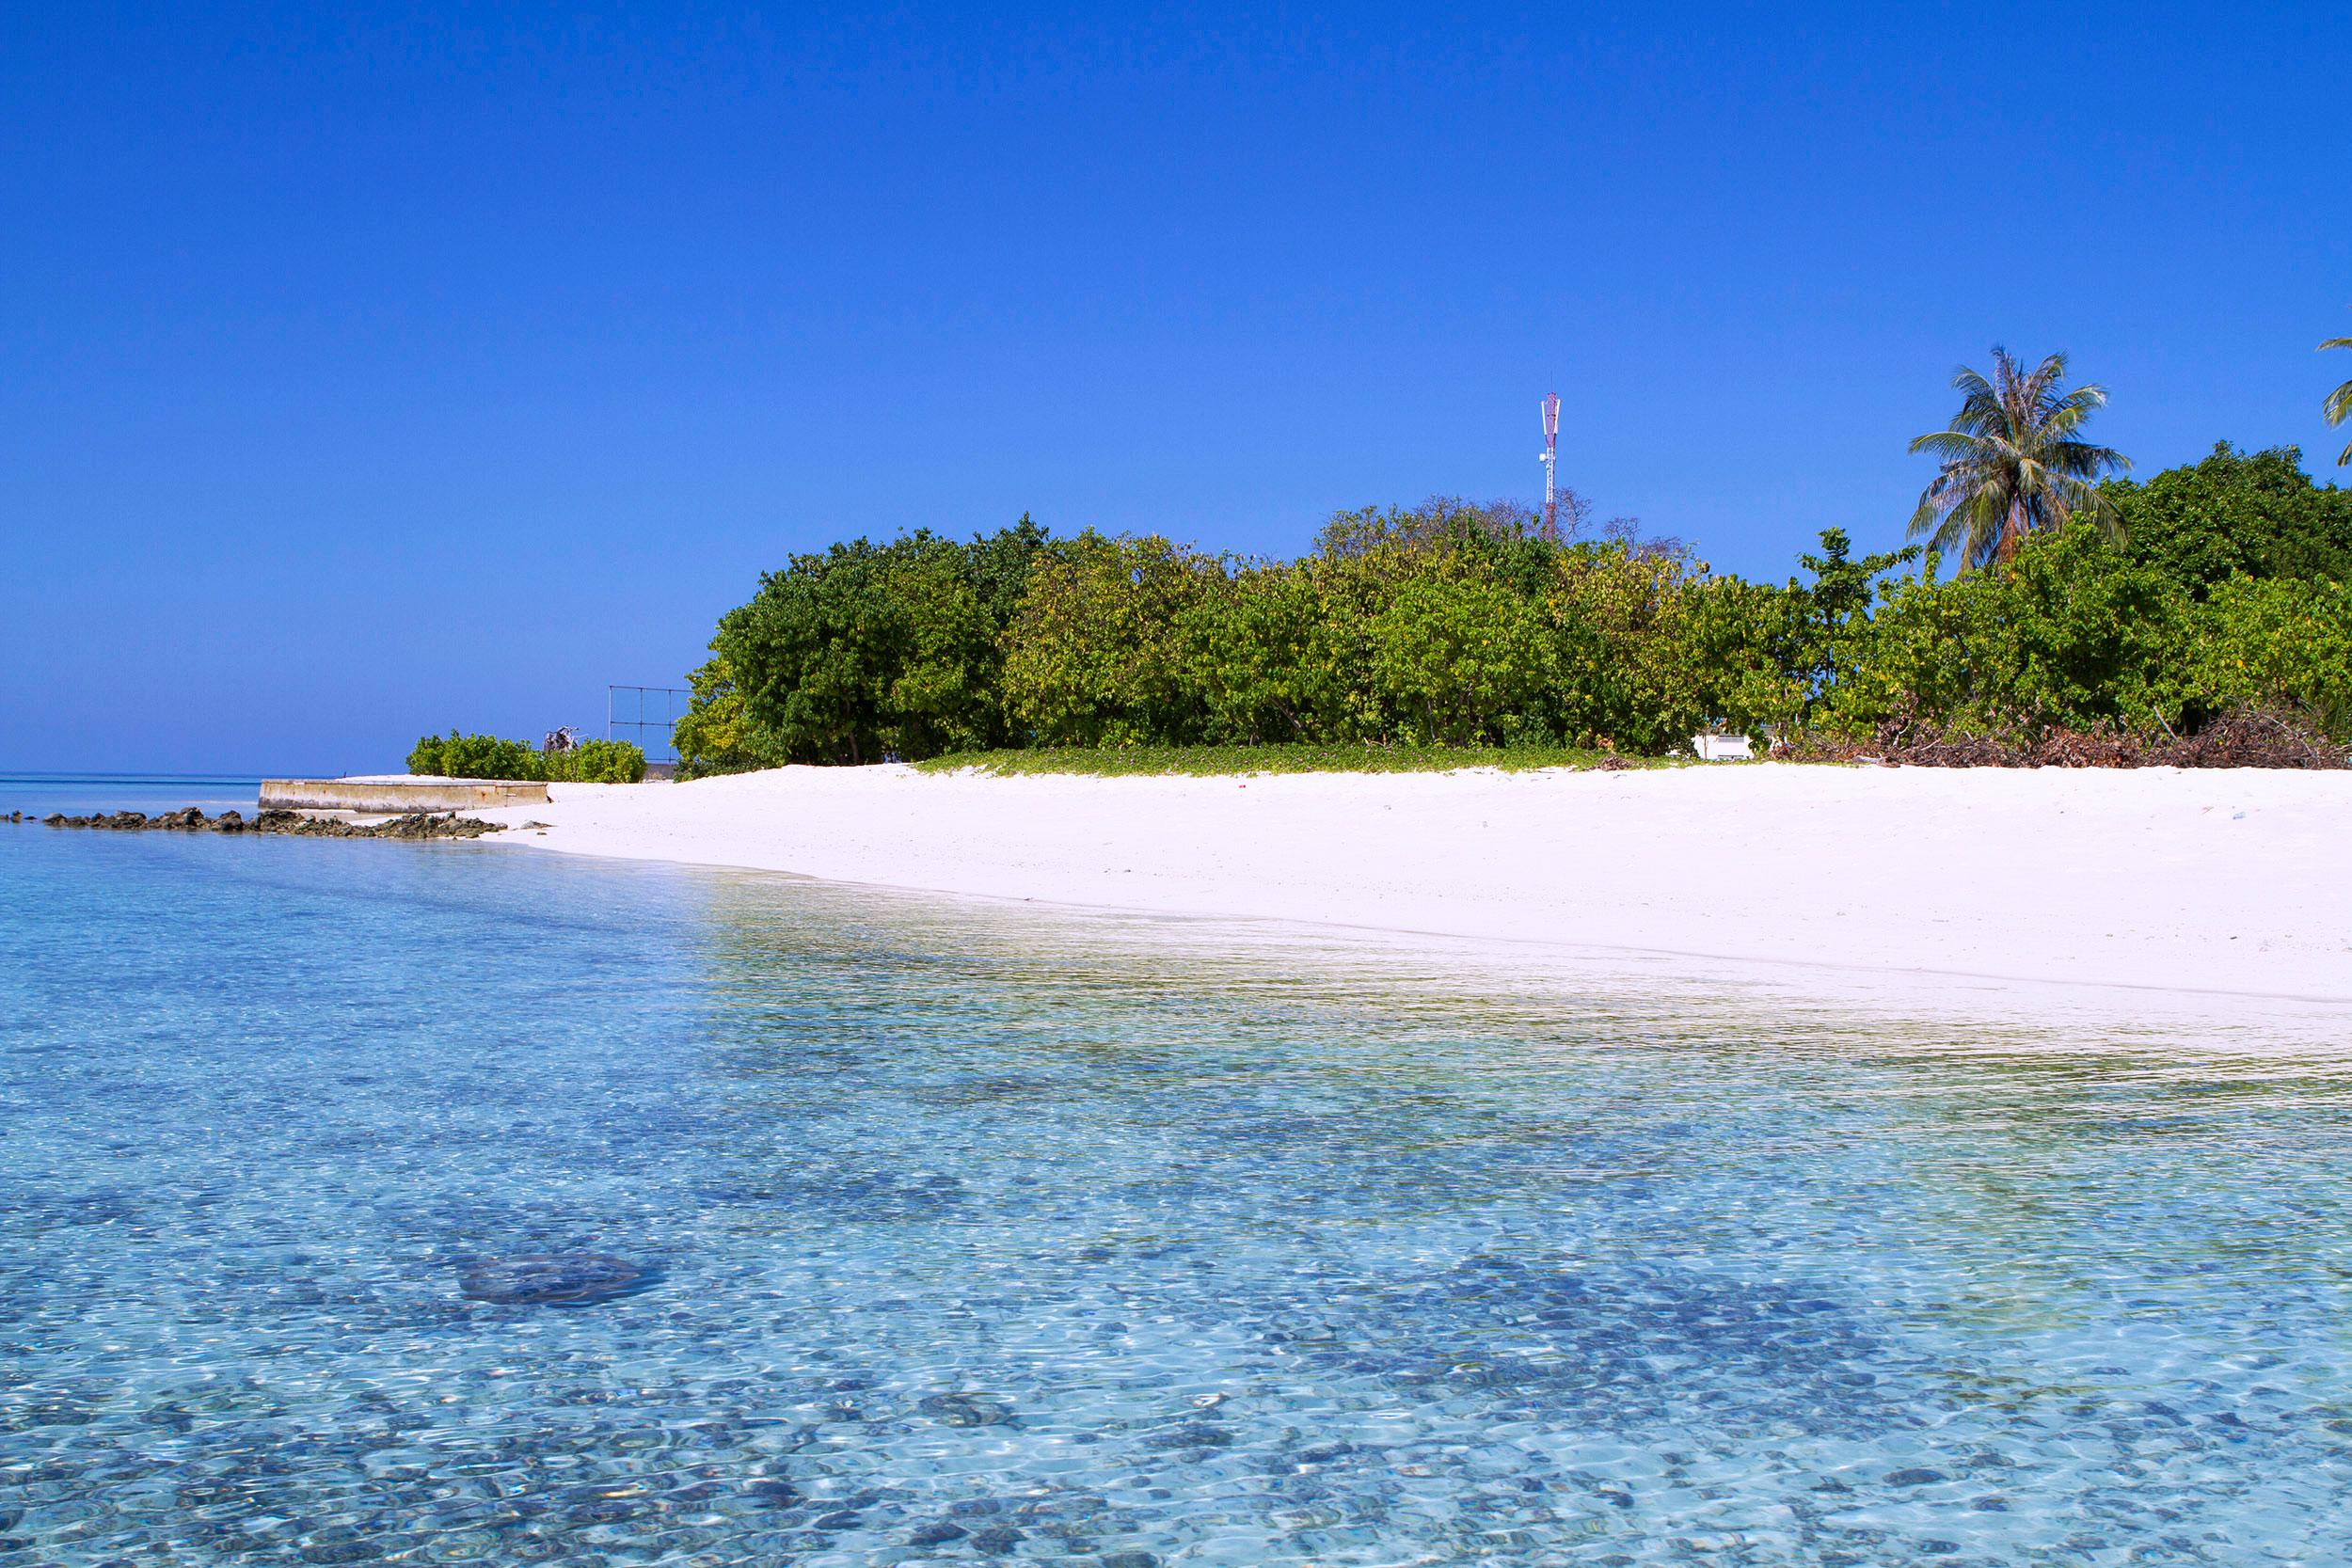 43-Tropic-Tree-Maldives-03-Gulhi